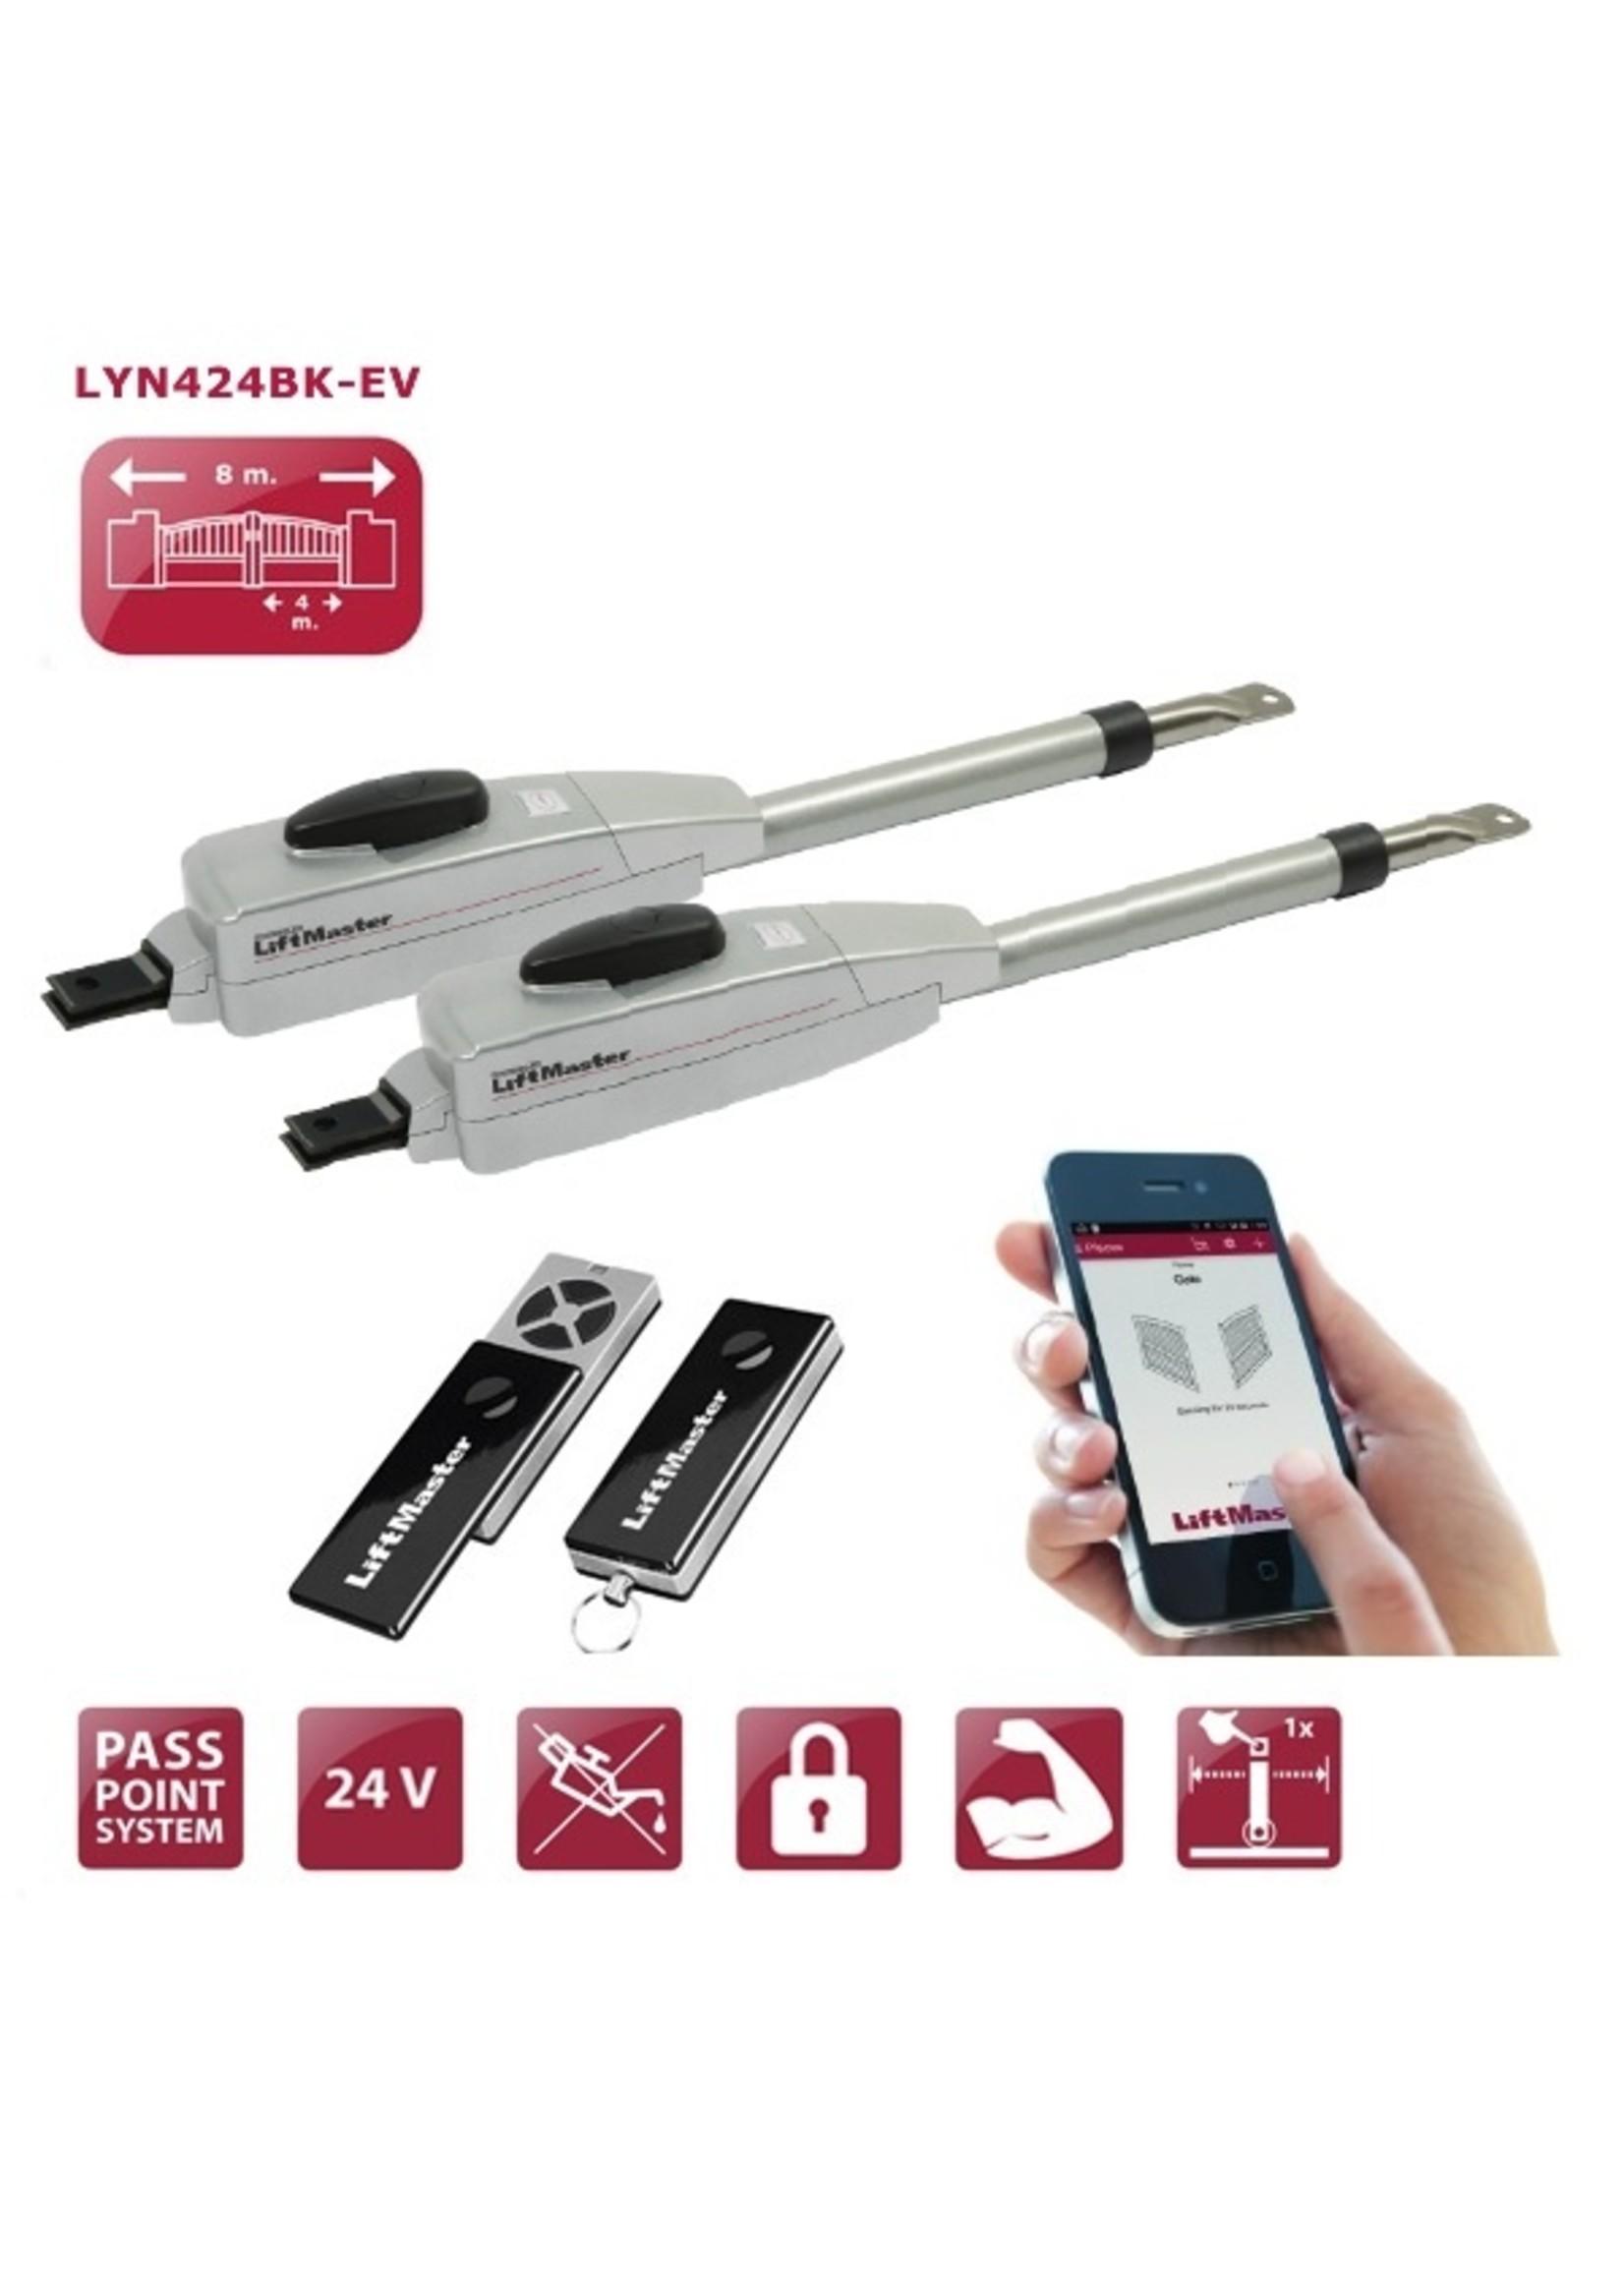 Liftmaster LYN424K-EV 24V automatisme portail à battants LYN400-24